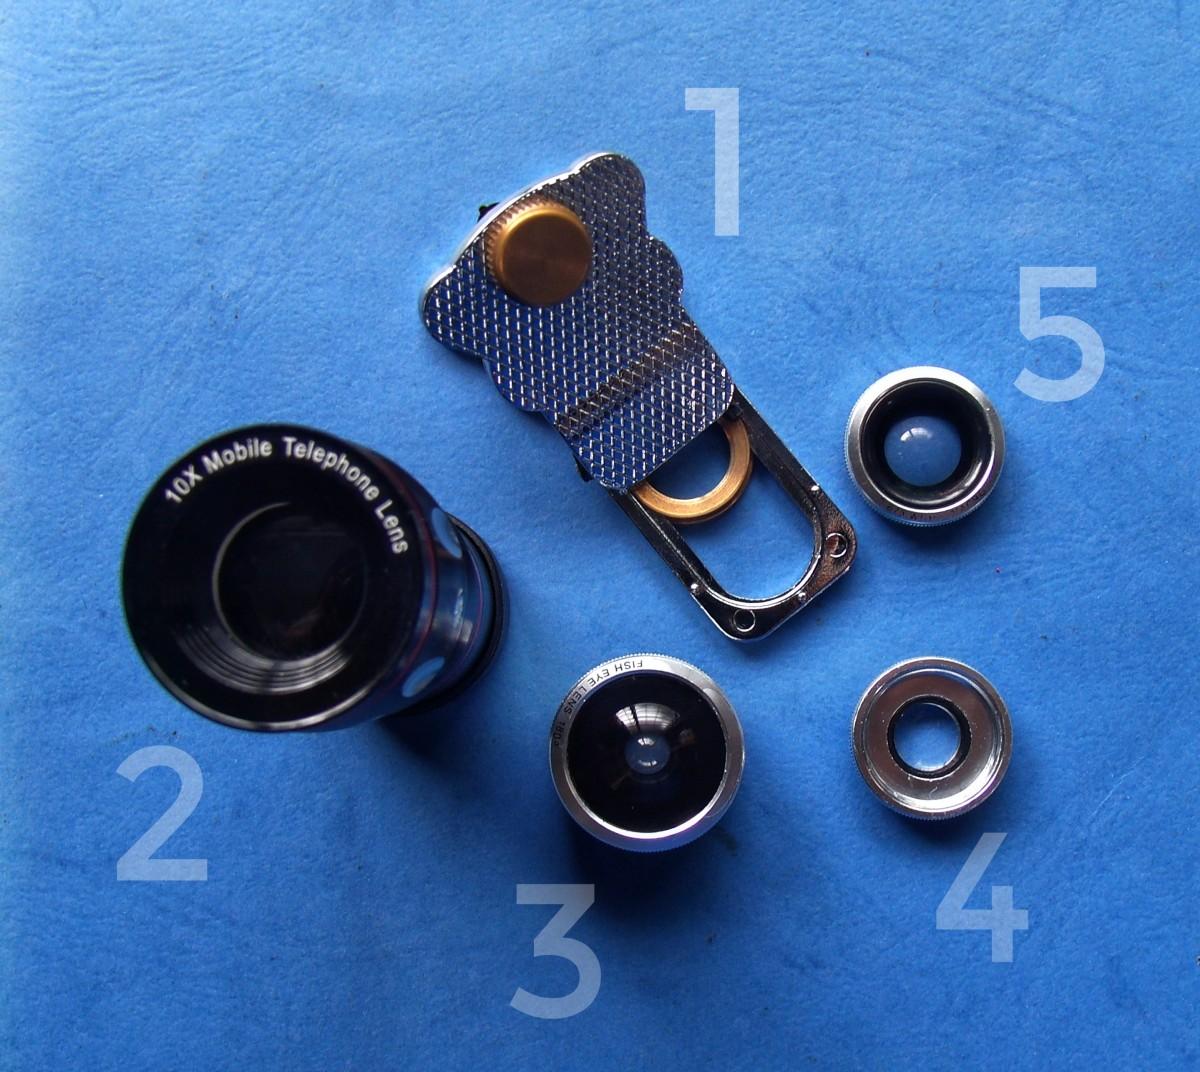 Universal Mobile Lens Kit:  1. Clamp 2. Telephoto Lens 3. Fish Eye Lens 4. MACRO 5. Wide Angle